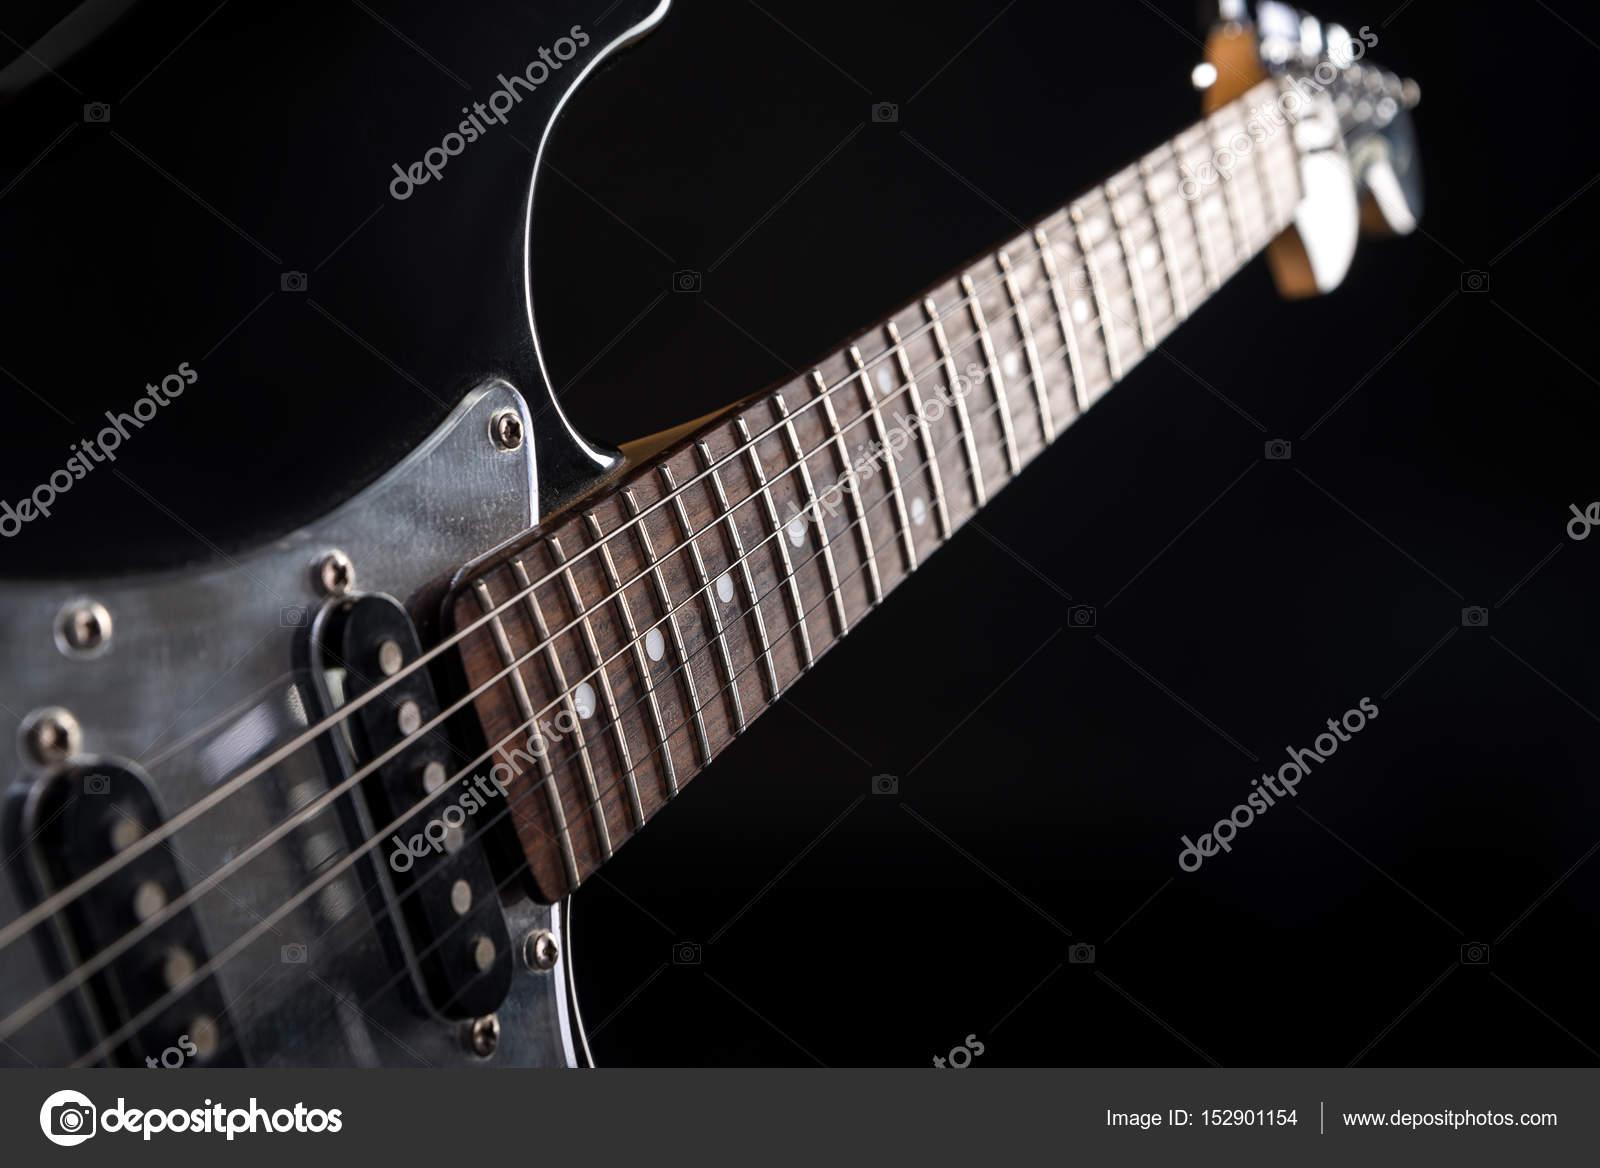 Vendita quadro jazz guitar impro carlo baroncelli pitturiamo